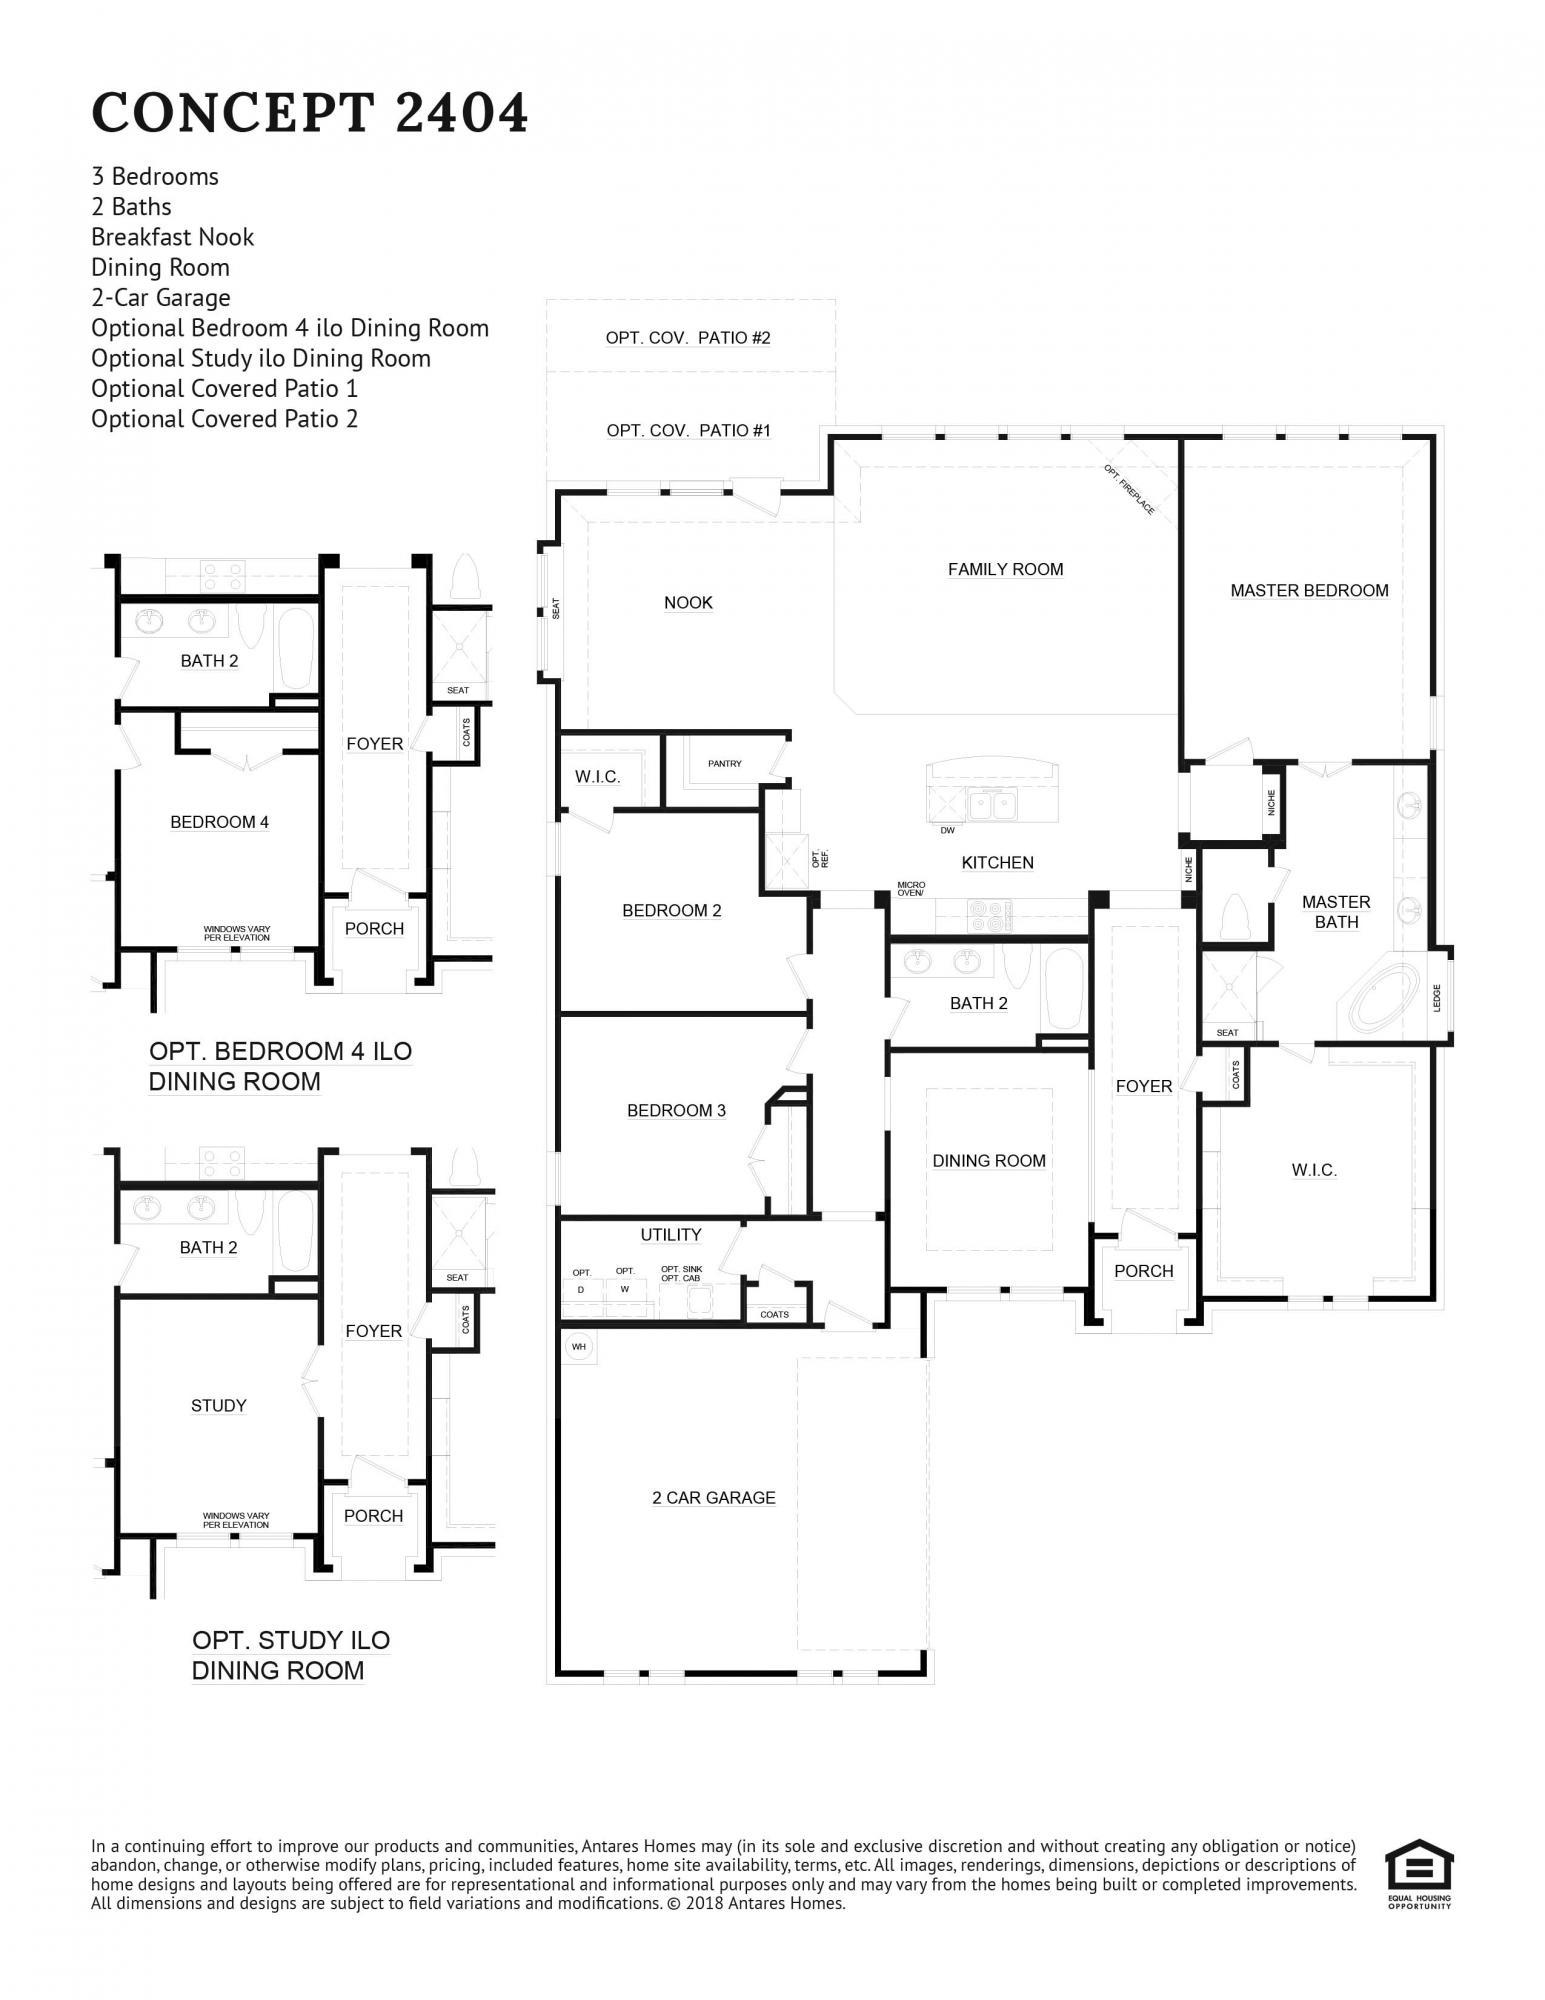 Concept 2404 Floorplan